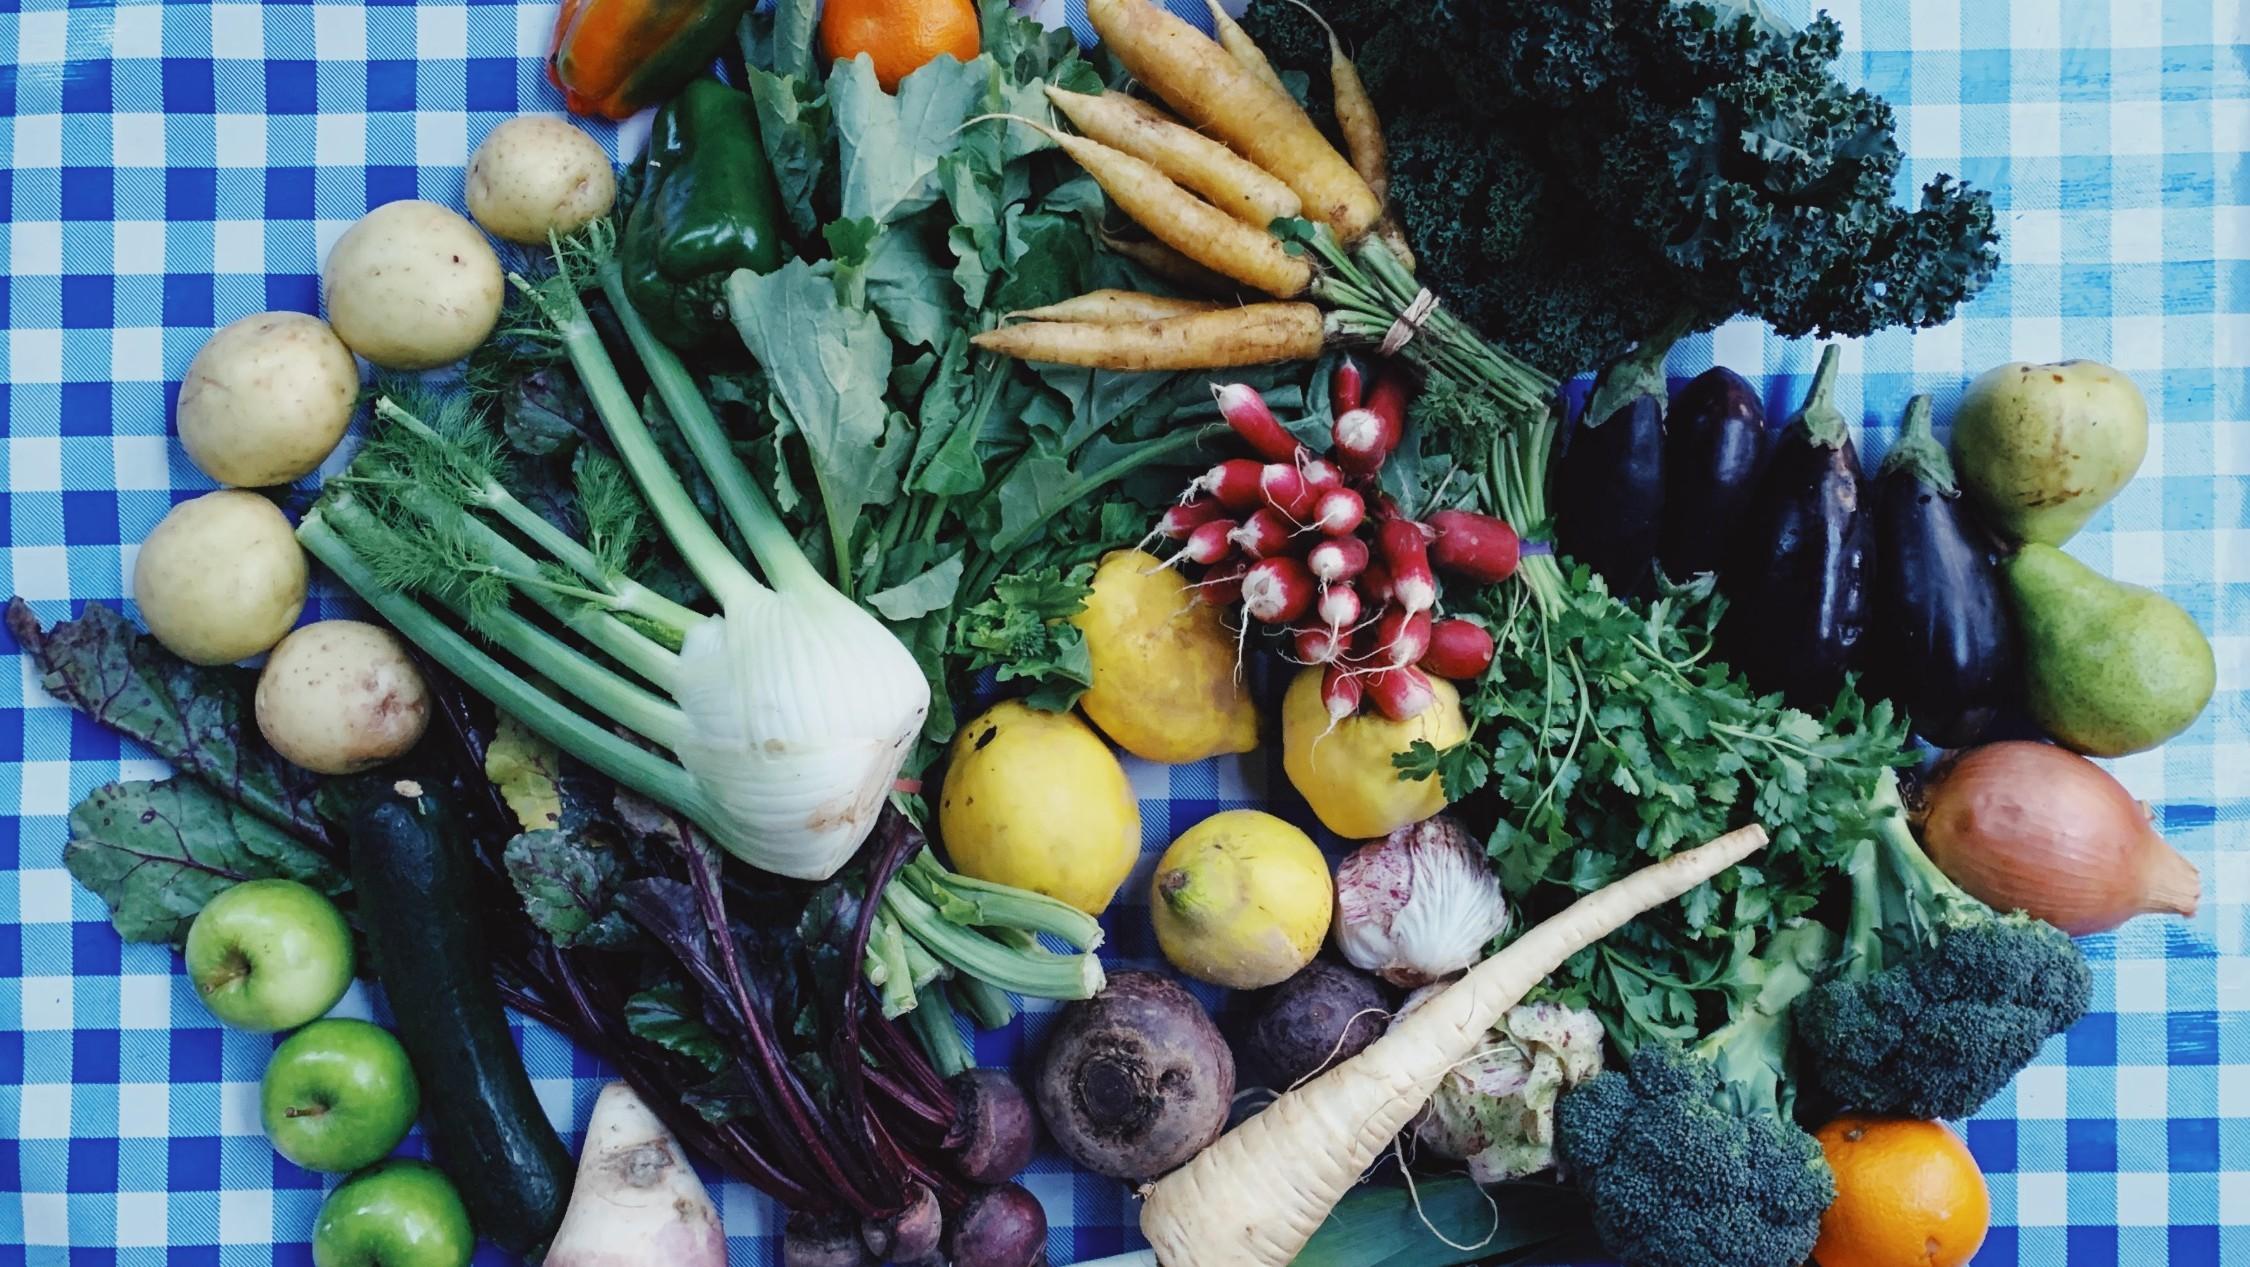 Northside Fruit and Veg